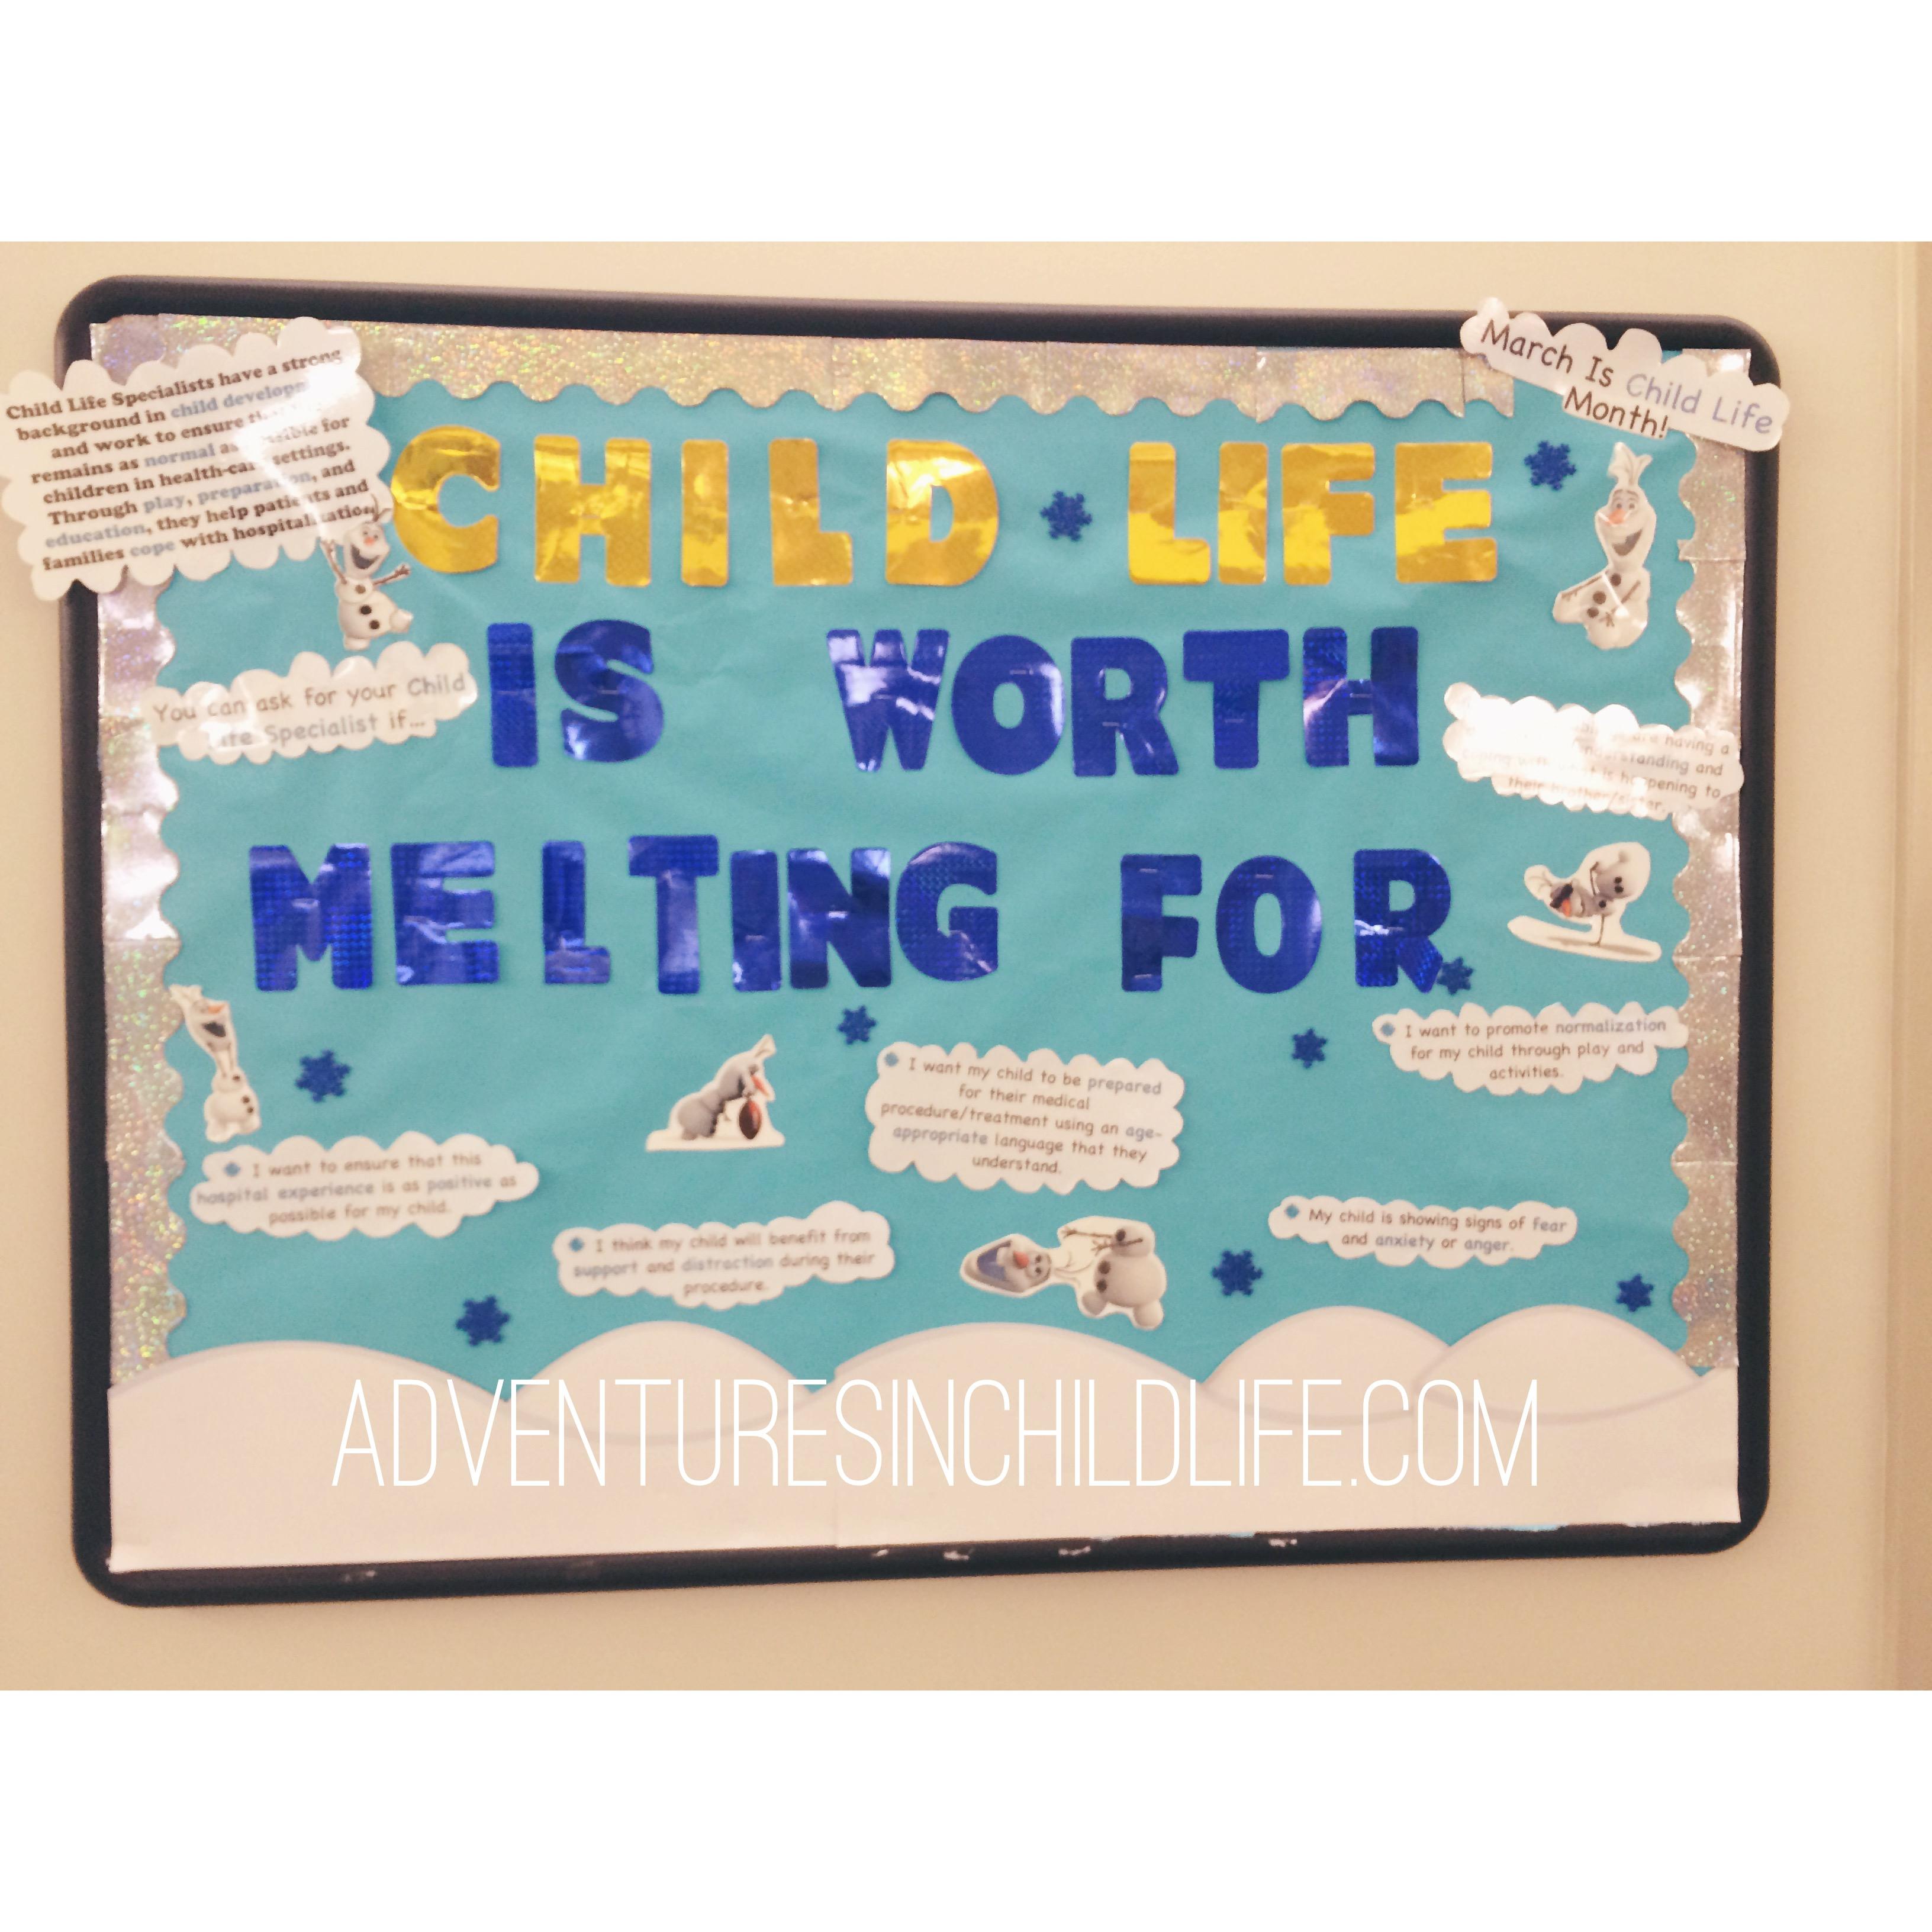 Child life month!